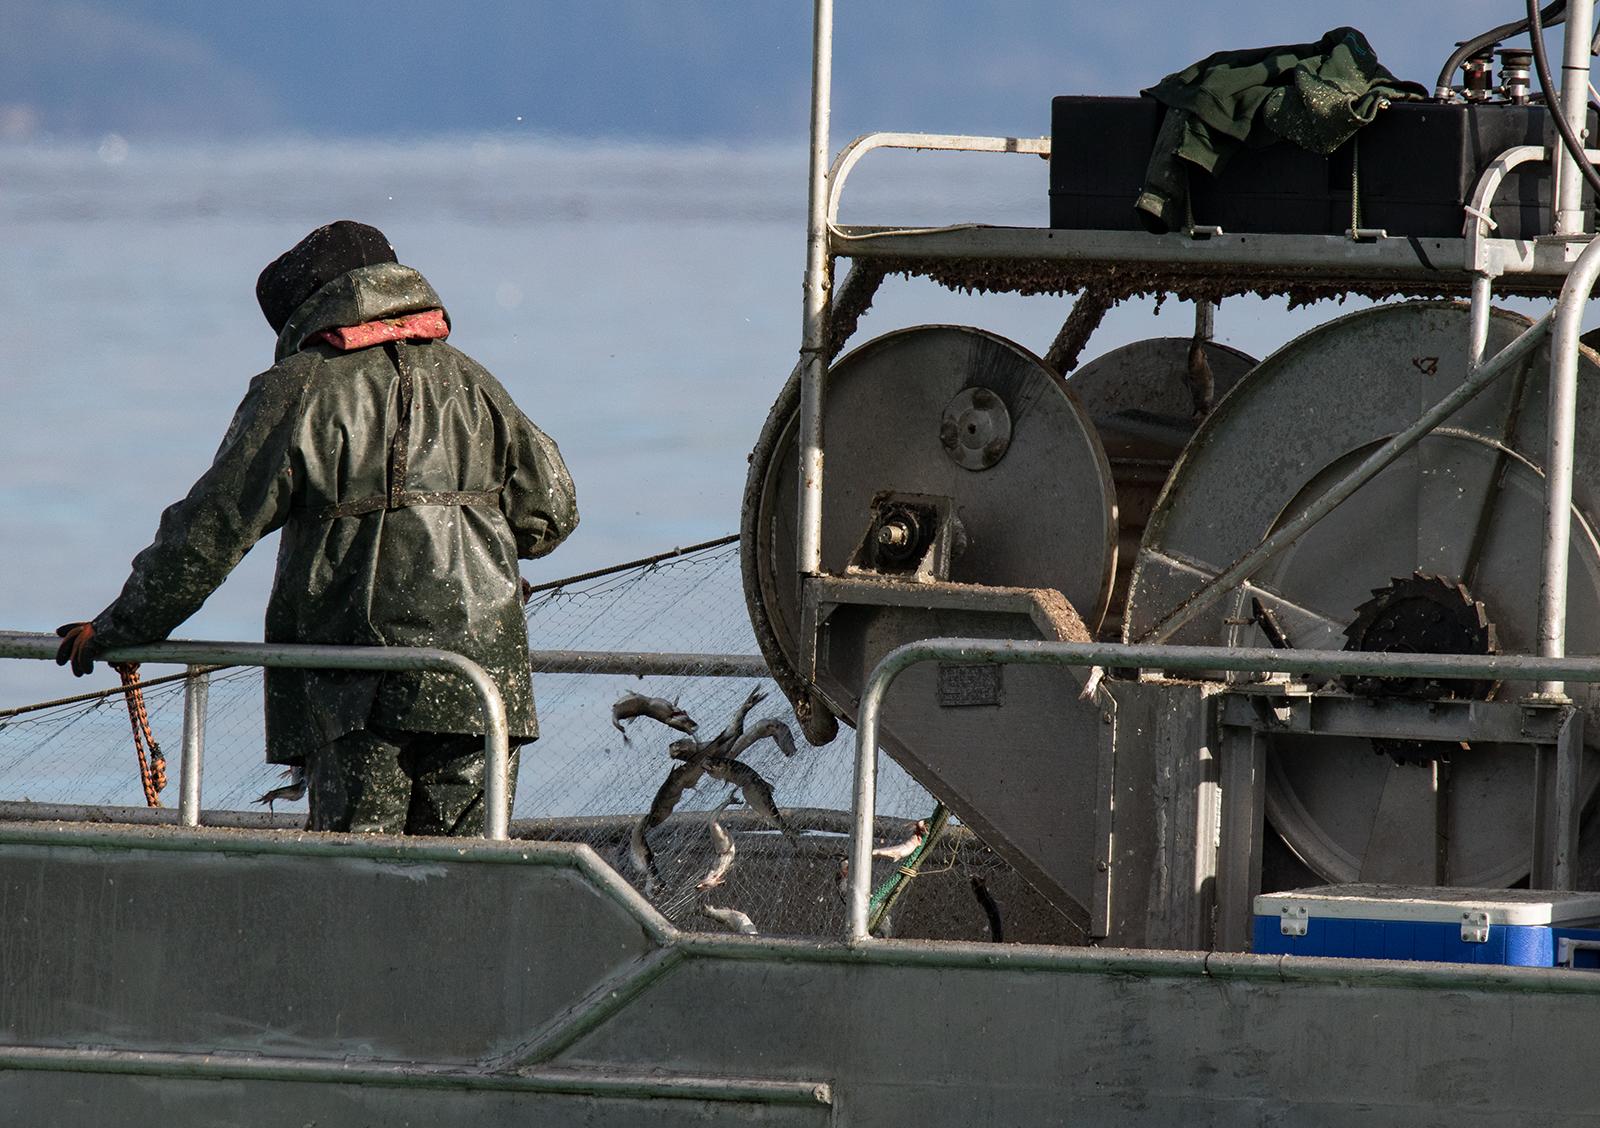 Fisherman on Gillnetter off Parksville